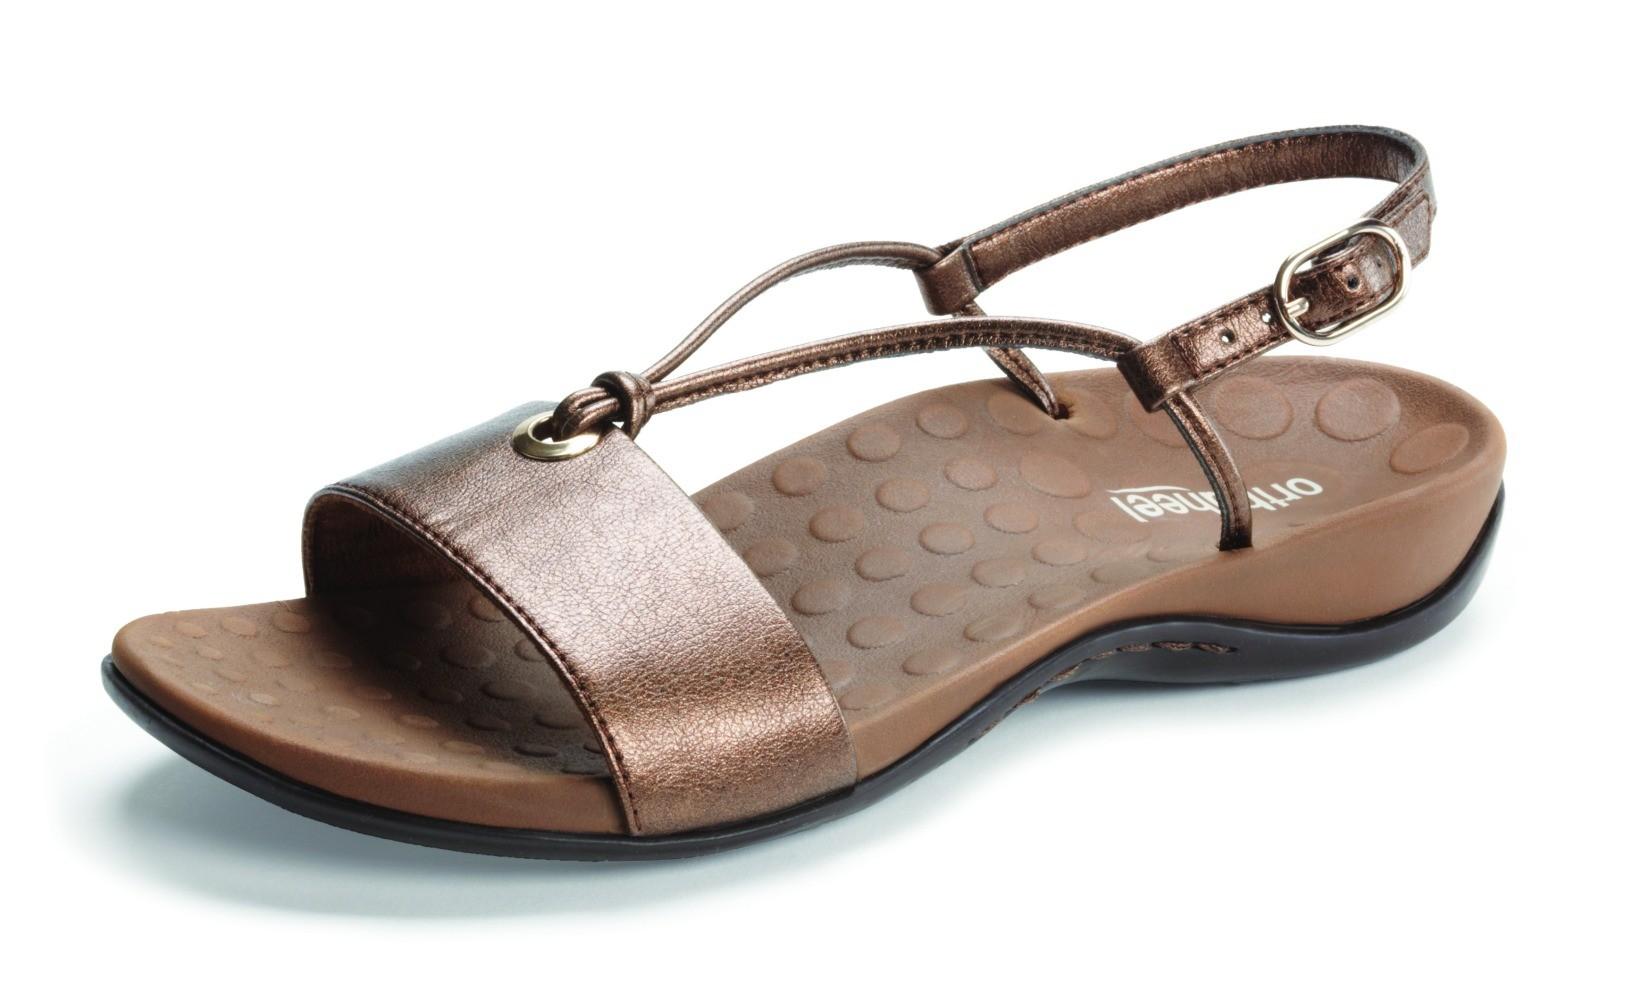 Orthaheel Mia Slingback Sandal Bronze Size 6 Online Discount